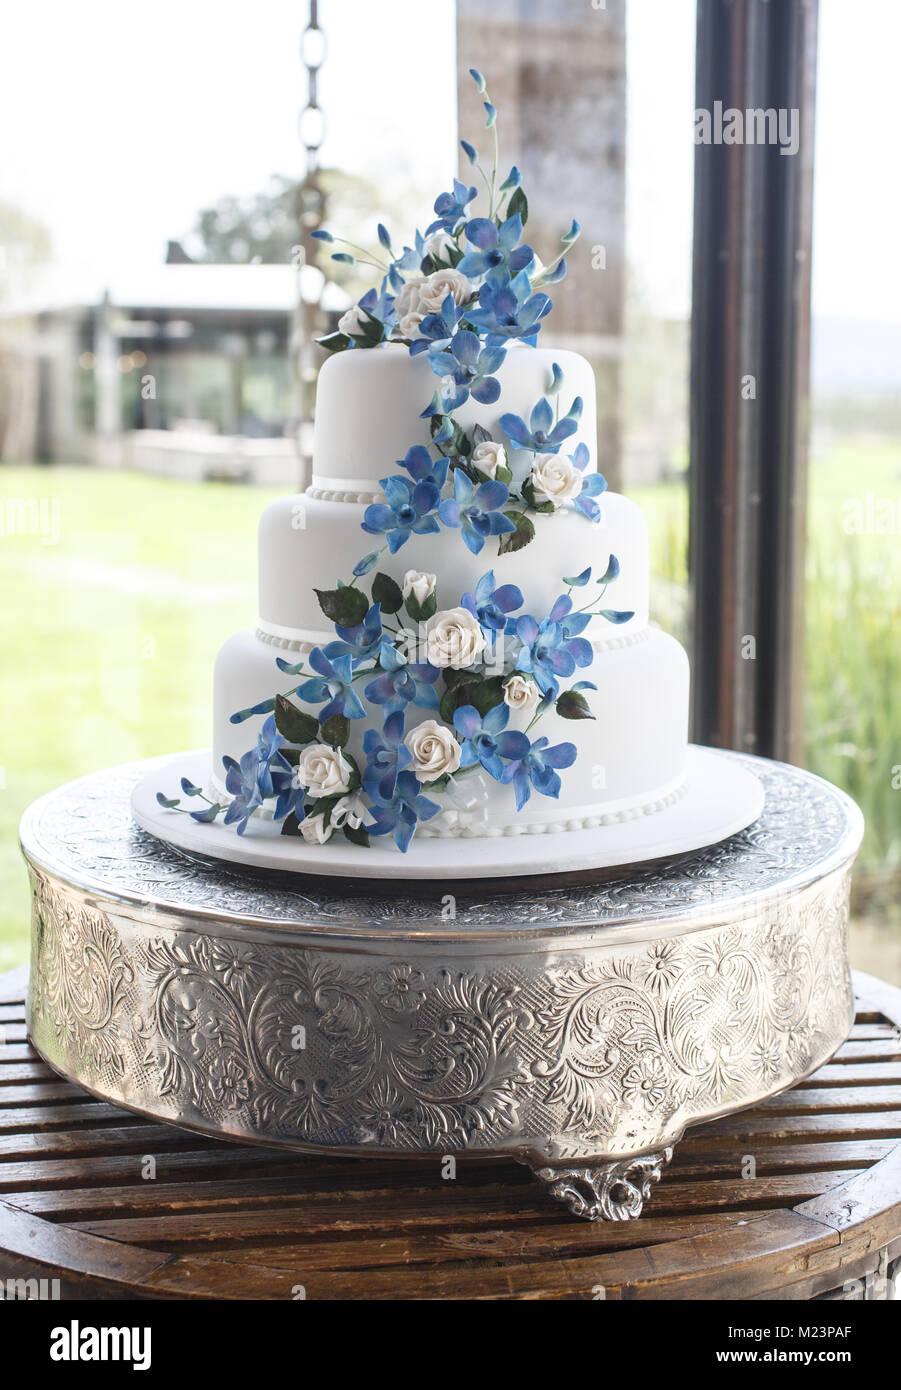 Wedding cake at an Australian wedding - Stock Image